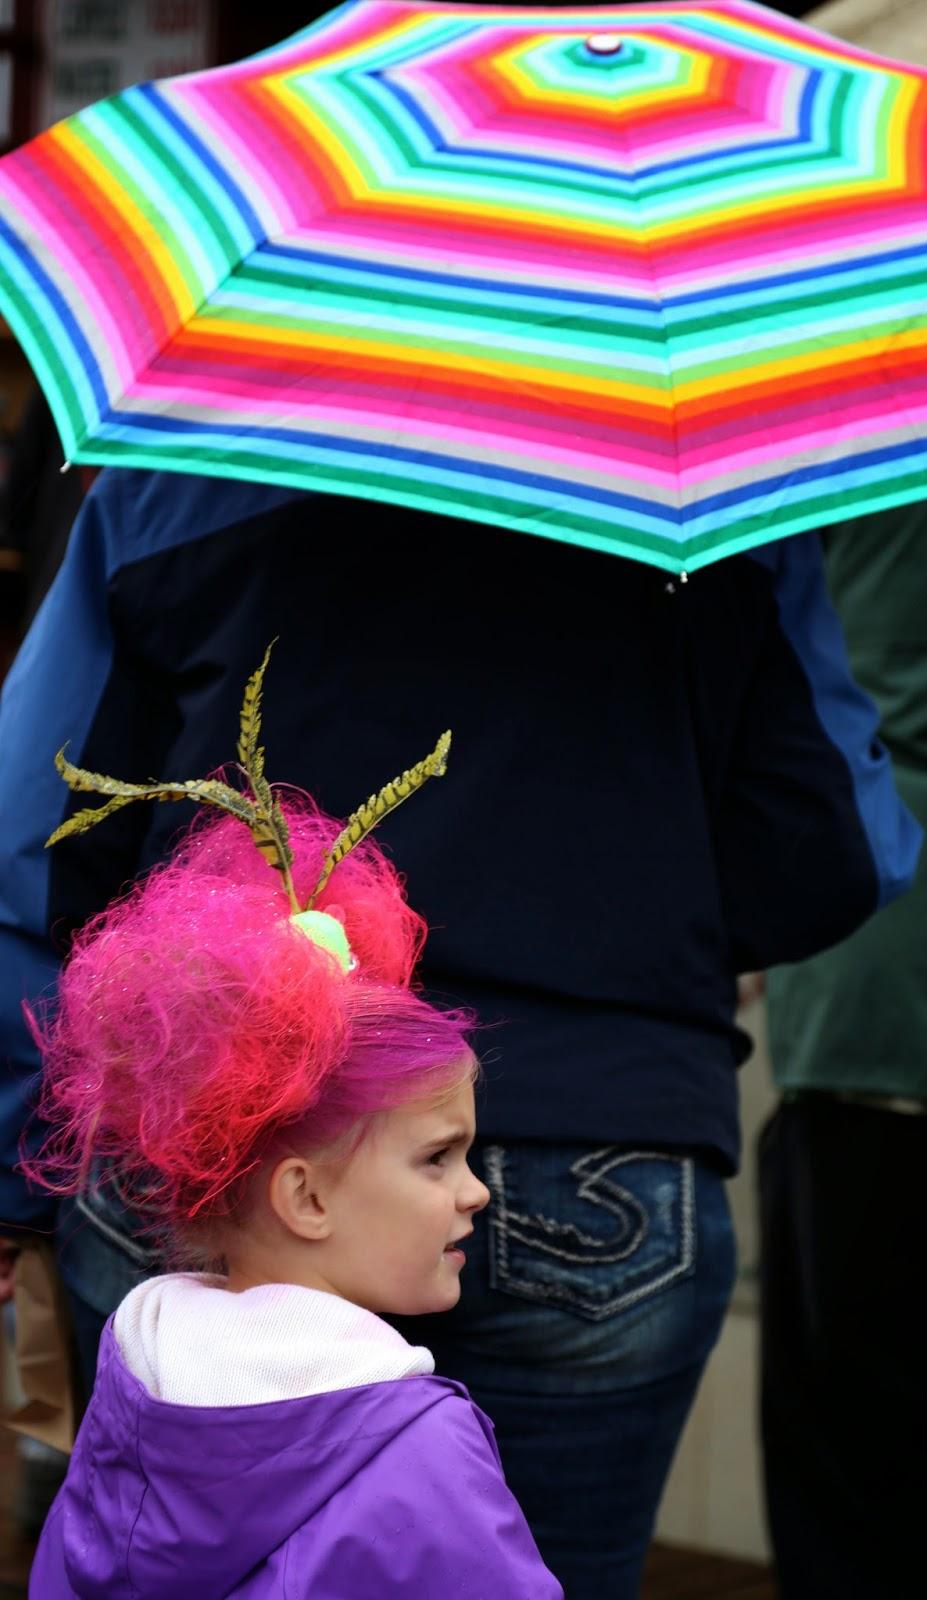 Child with 'wild hair', Alaska State Fair